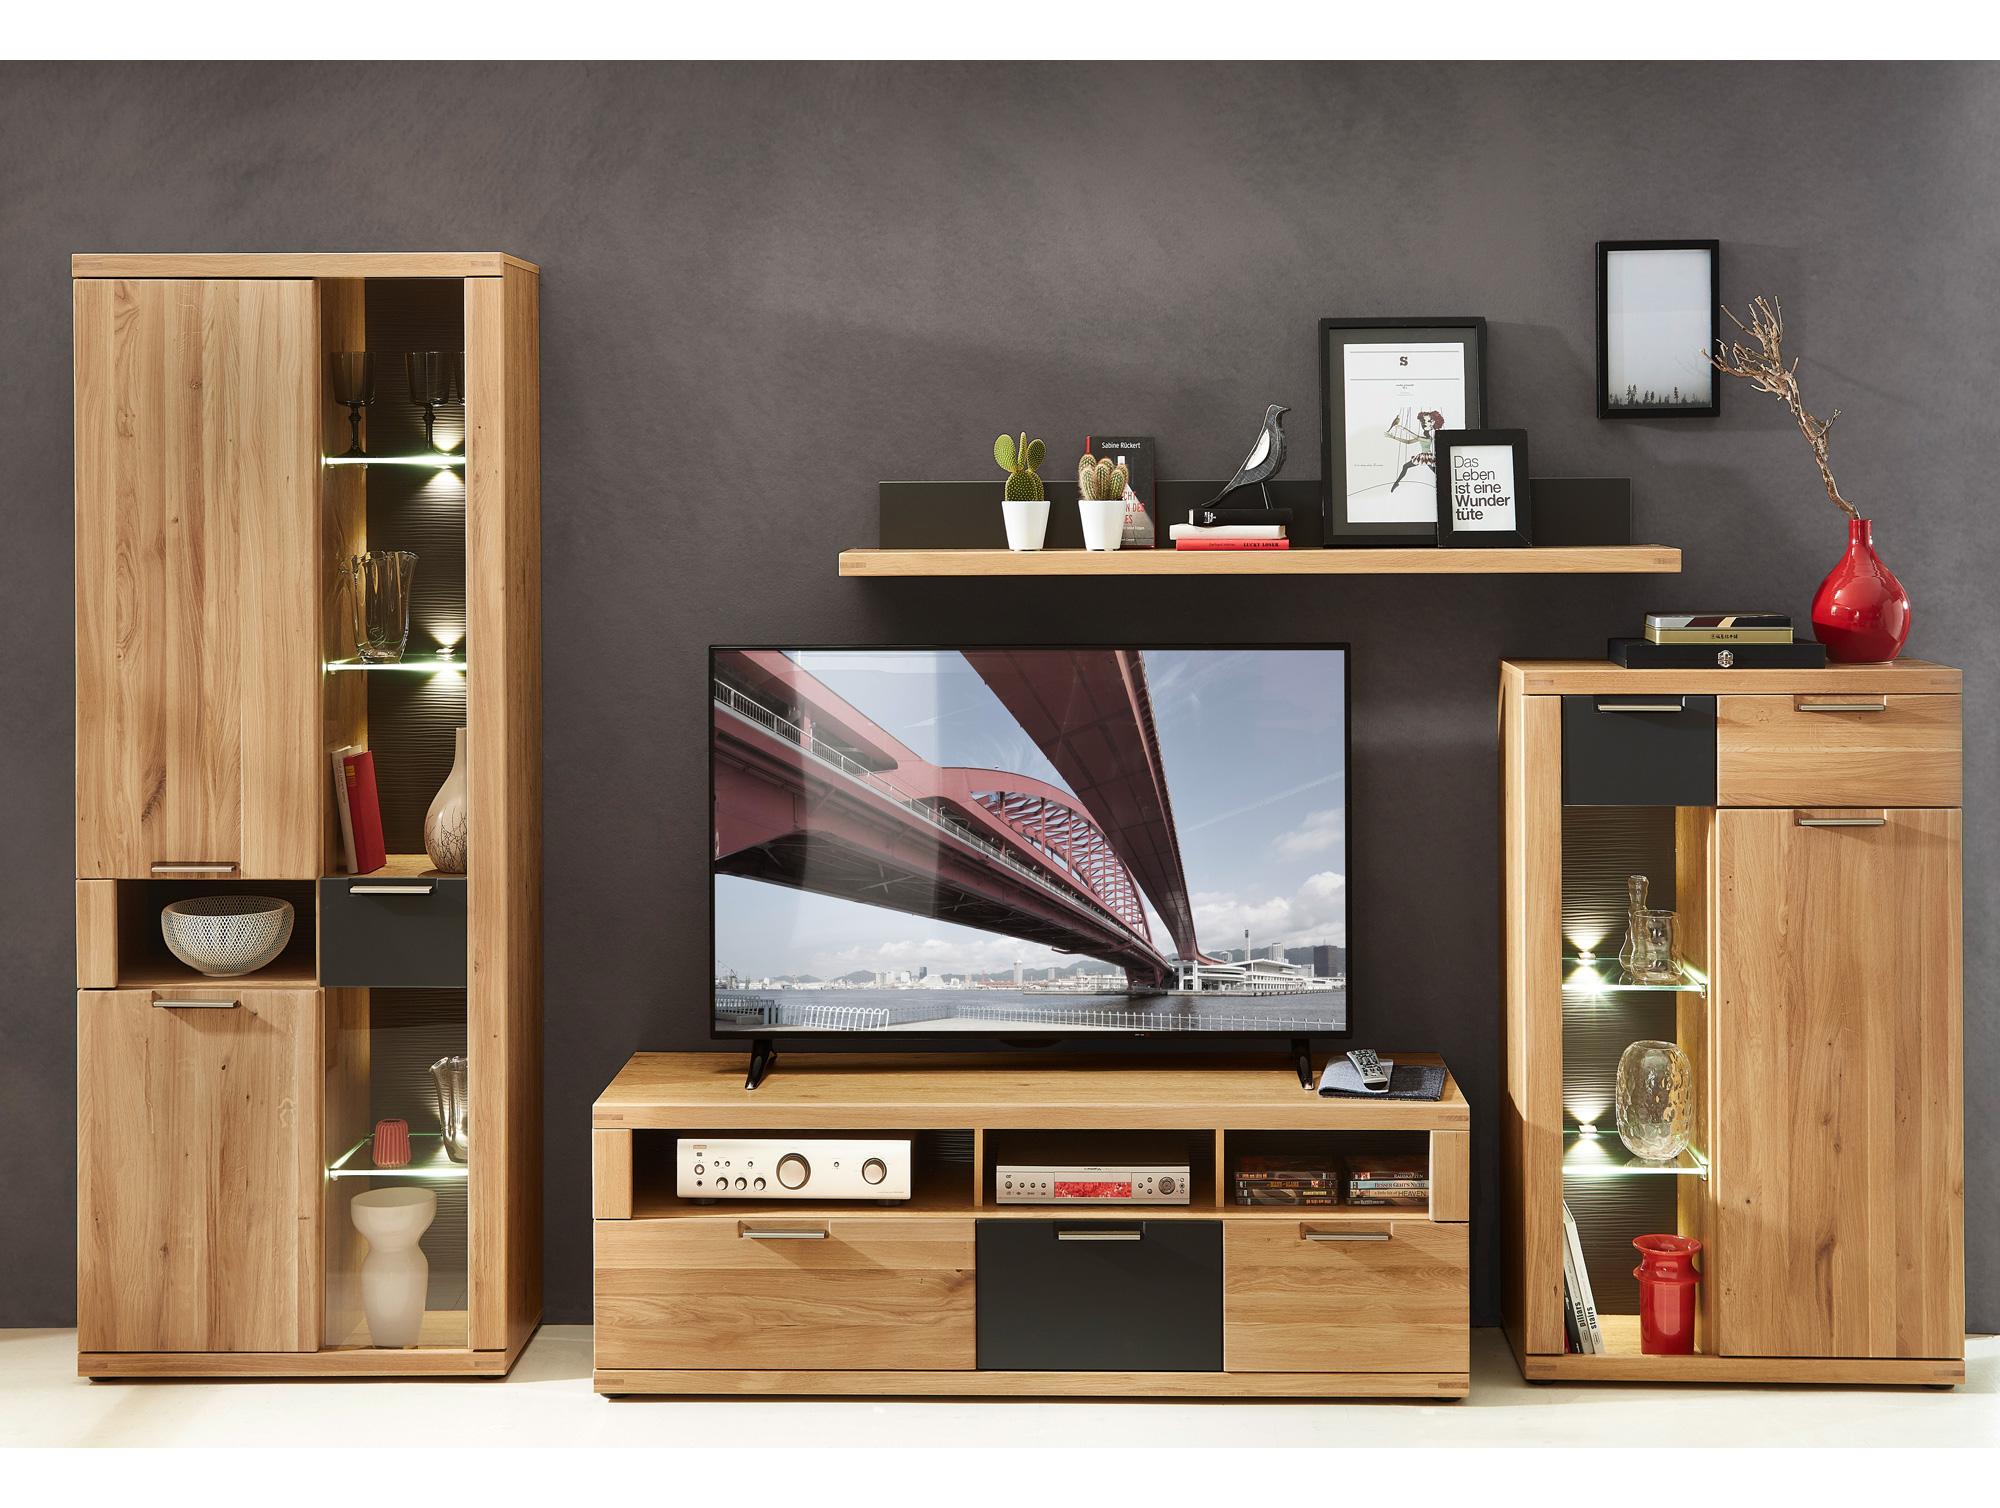 bianca i wohnwand wildeiche massiv. Black Bedroom Furniture Sets. Home Design Ideas